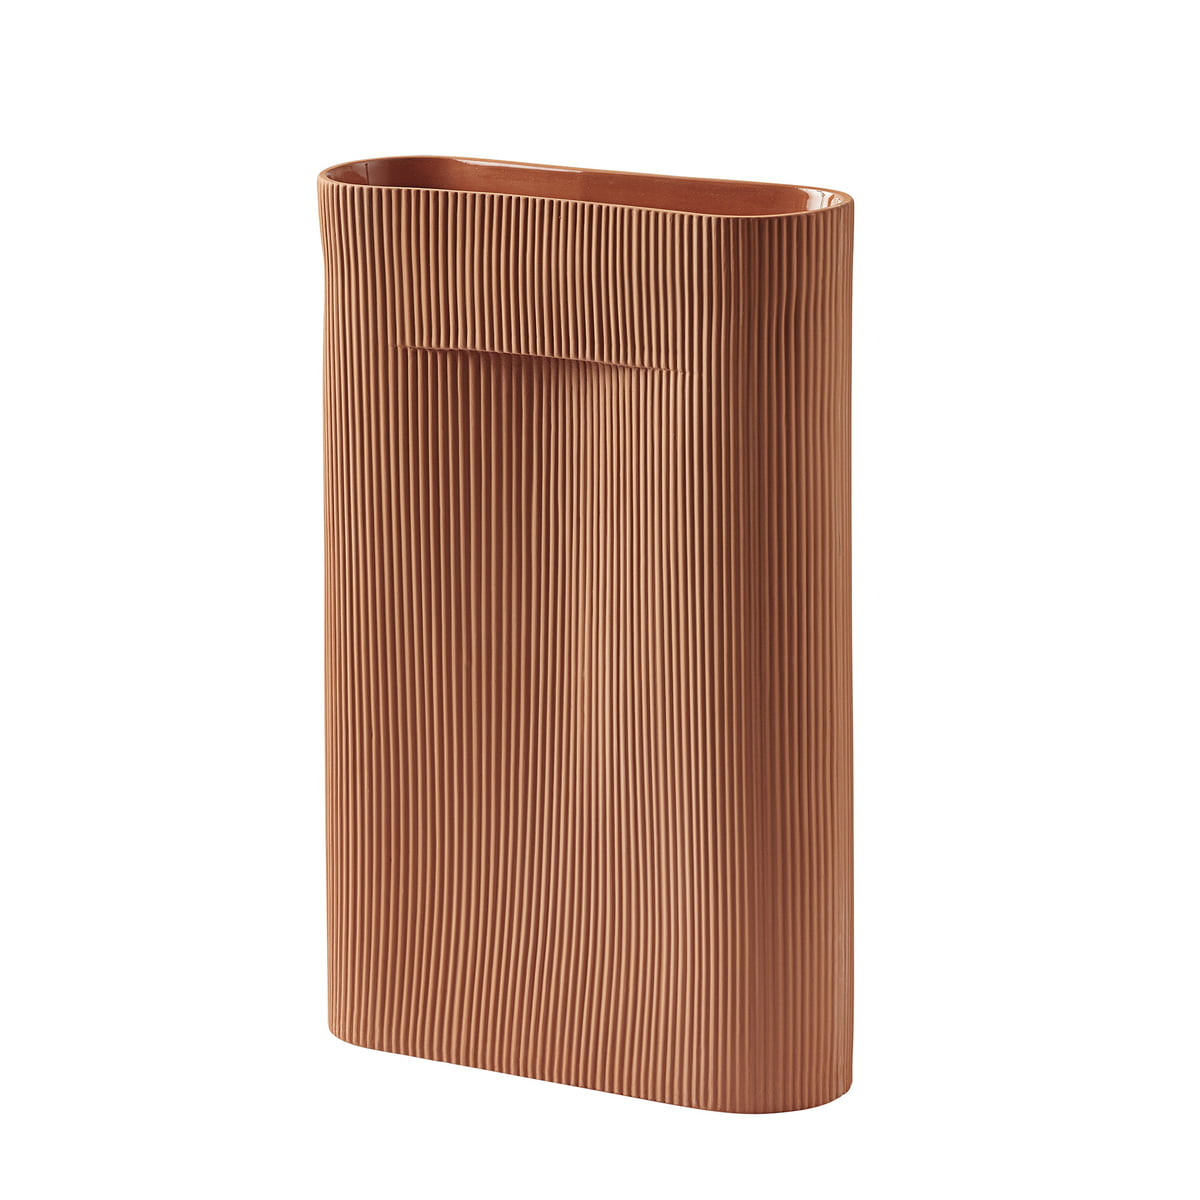 Muuto - Ridge Bodenvase H 48,5 cm, terrakotta | Dekoration > Vasen > Bodenvasen | Muuto